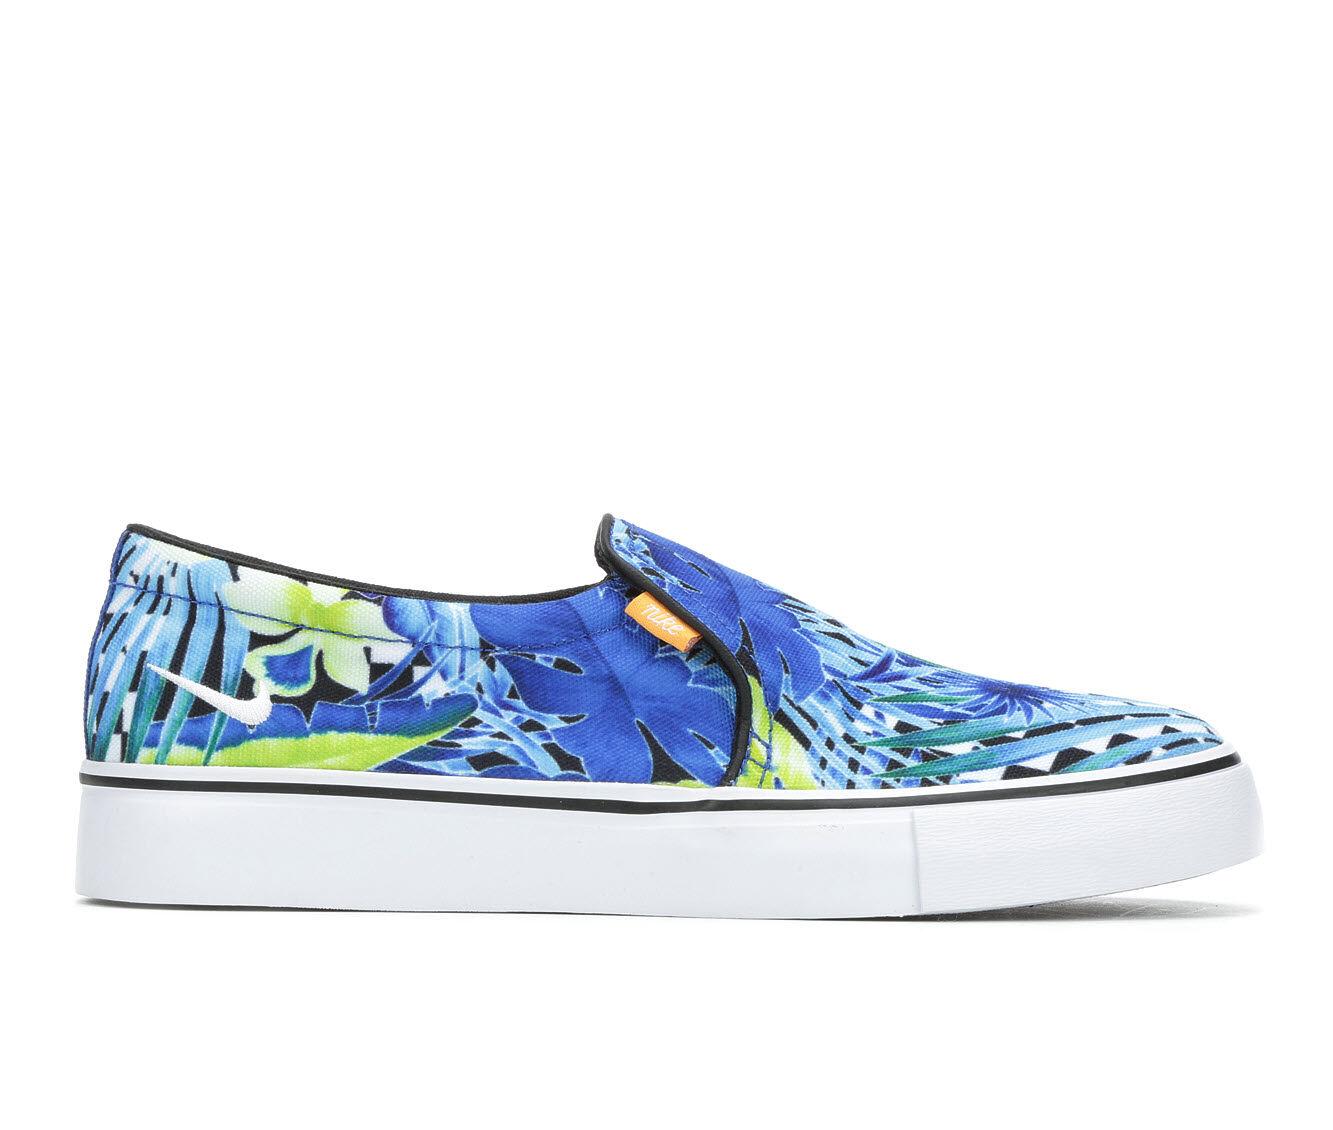 Women's Nike Court Royale AC Slip On Print Sneakers Blue/Green/Wht